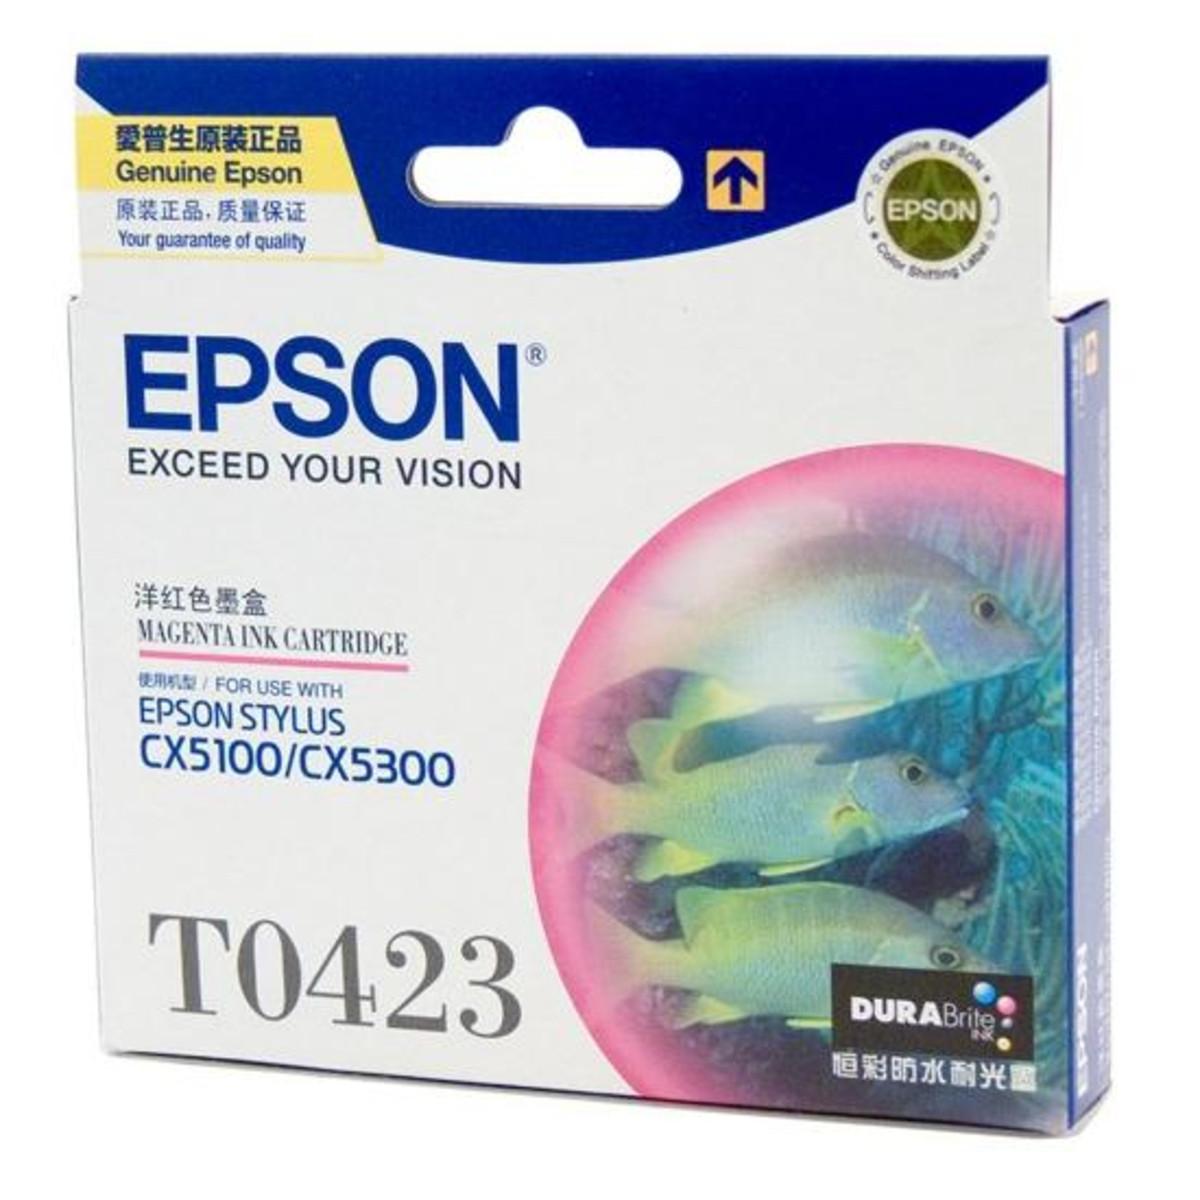 Epson T042390 Magenta Ink Cartridge - Exp 2013